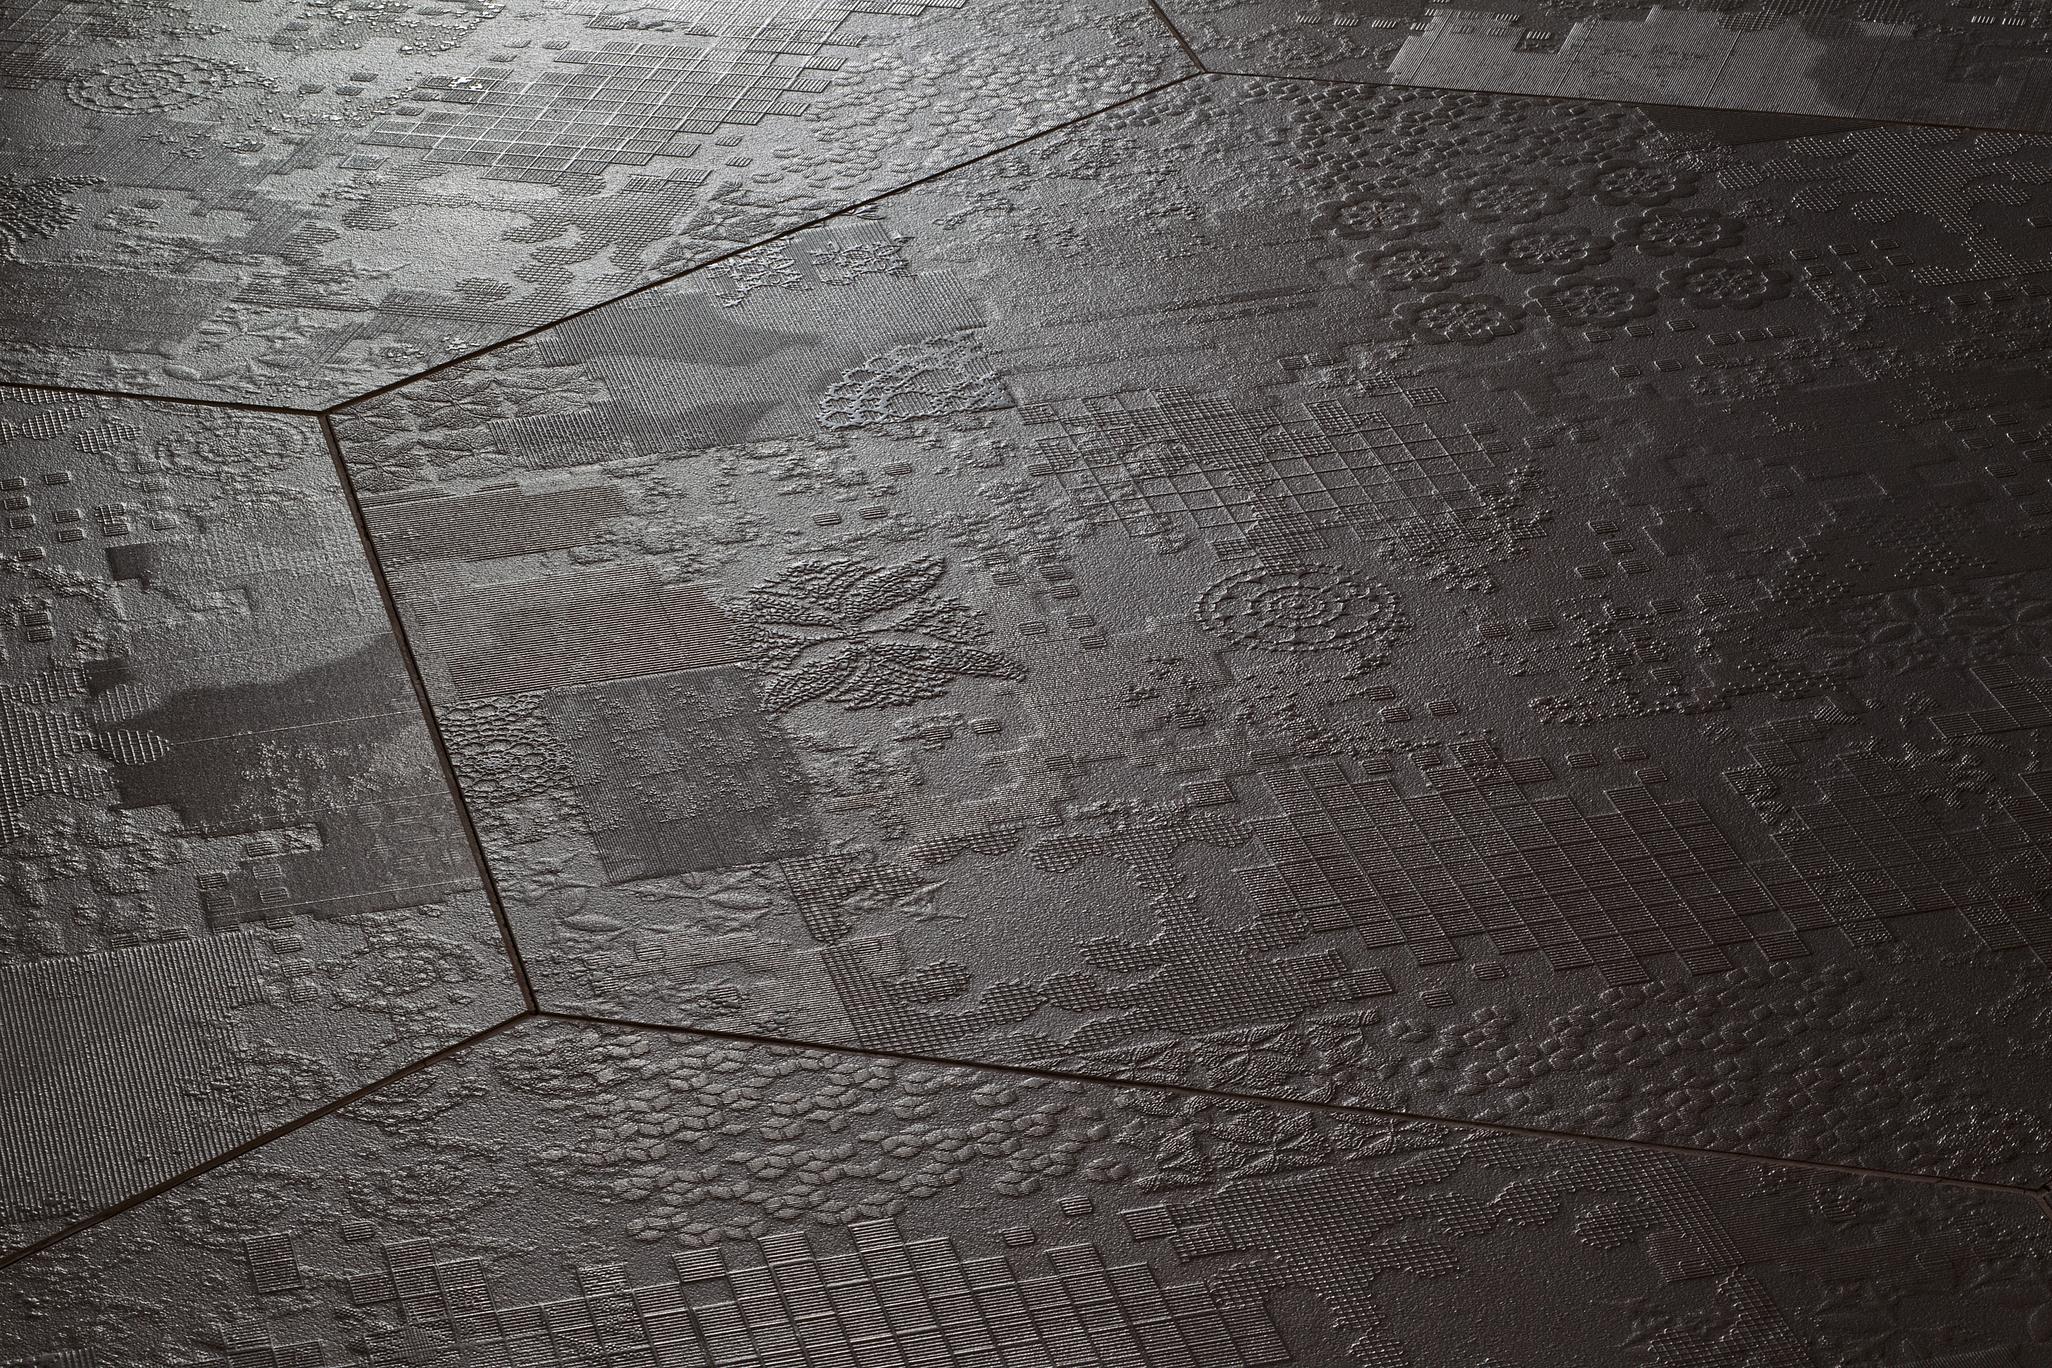 dechirer de mutina tile expert fournisseur de carrelage italien et espagnol italien photo. Black Bedroom Furniture Sets. Home Design Ideas